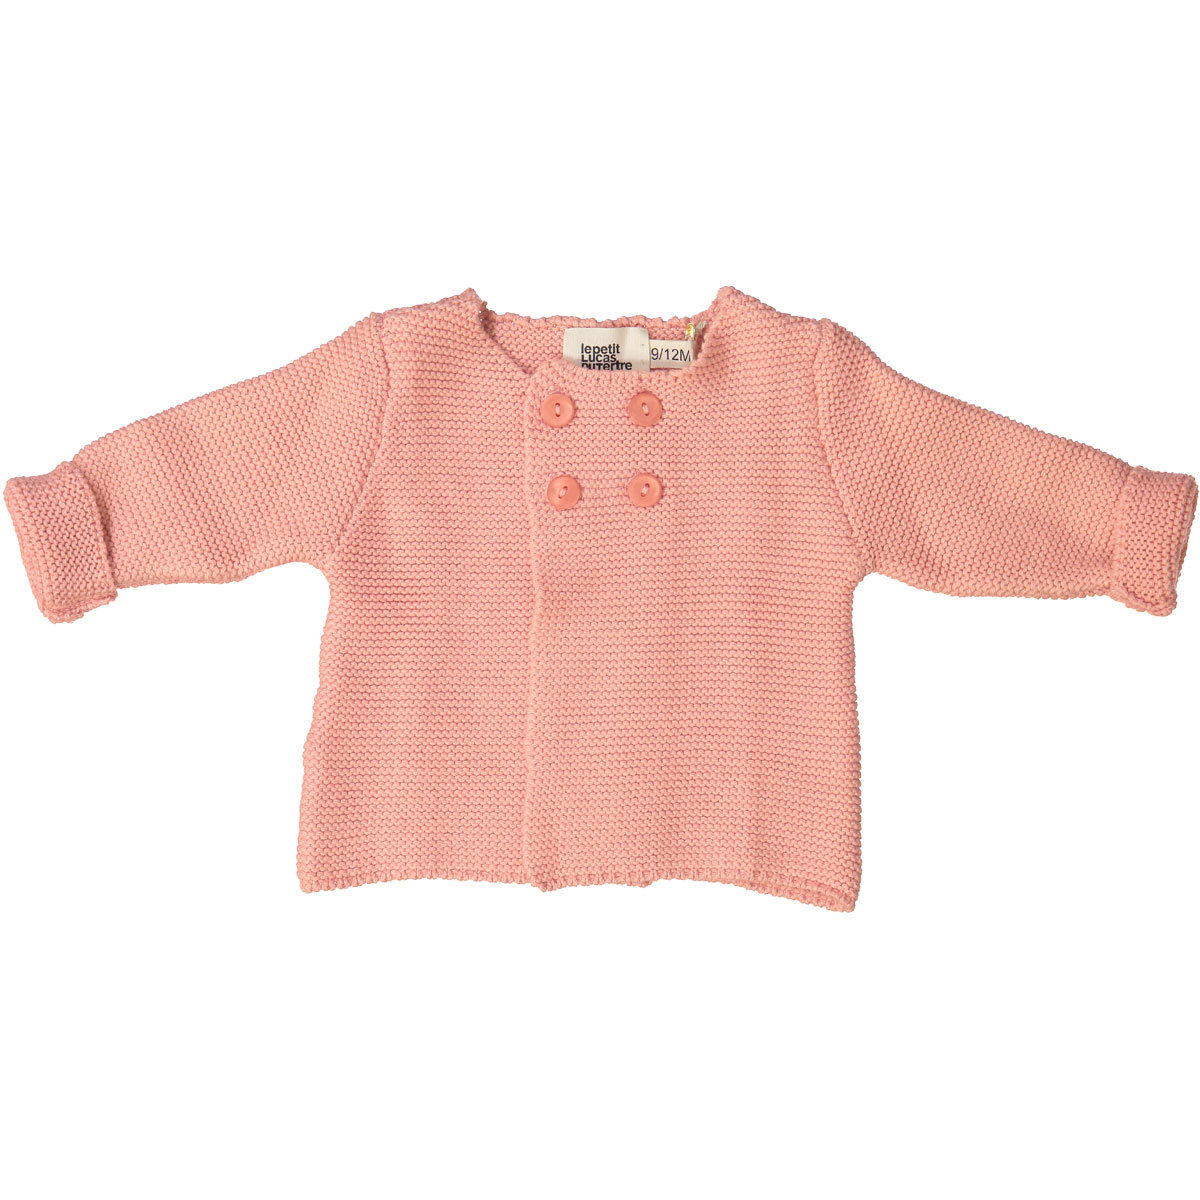 Haut bébé Cardigan Julia - Rose - 3/6 Mois Cardigan Julia - Rose - 3/6 Mois